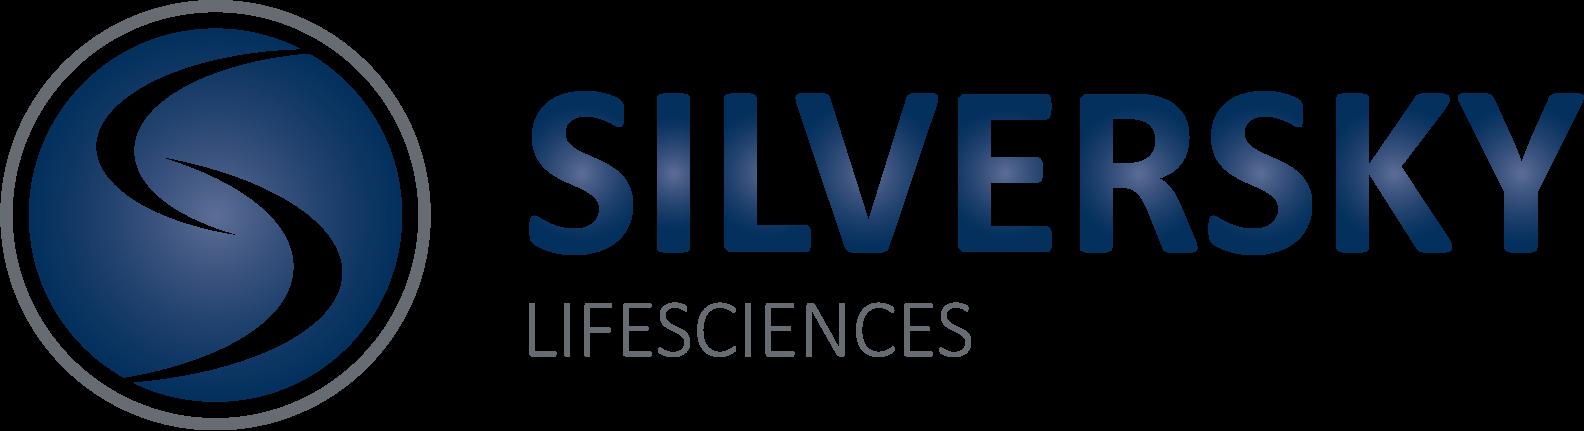 Silversky Life Sciences